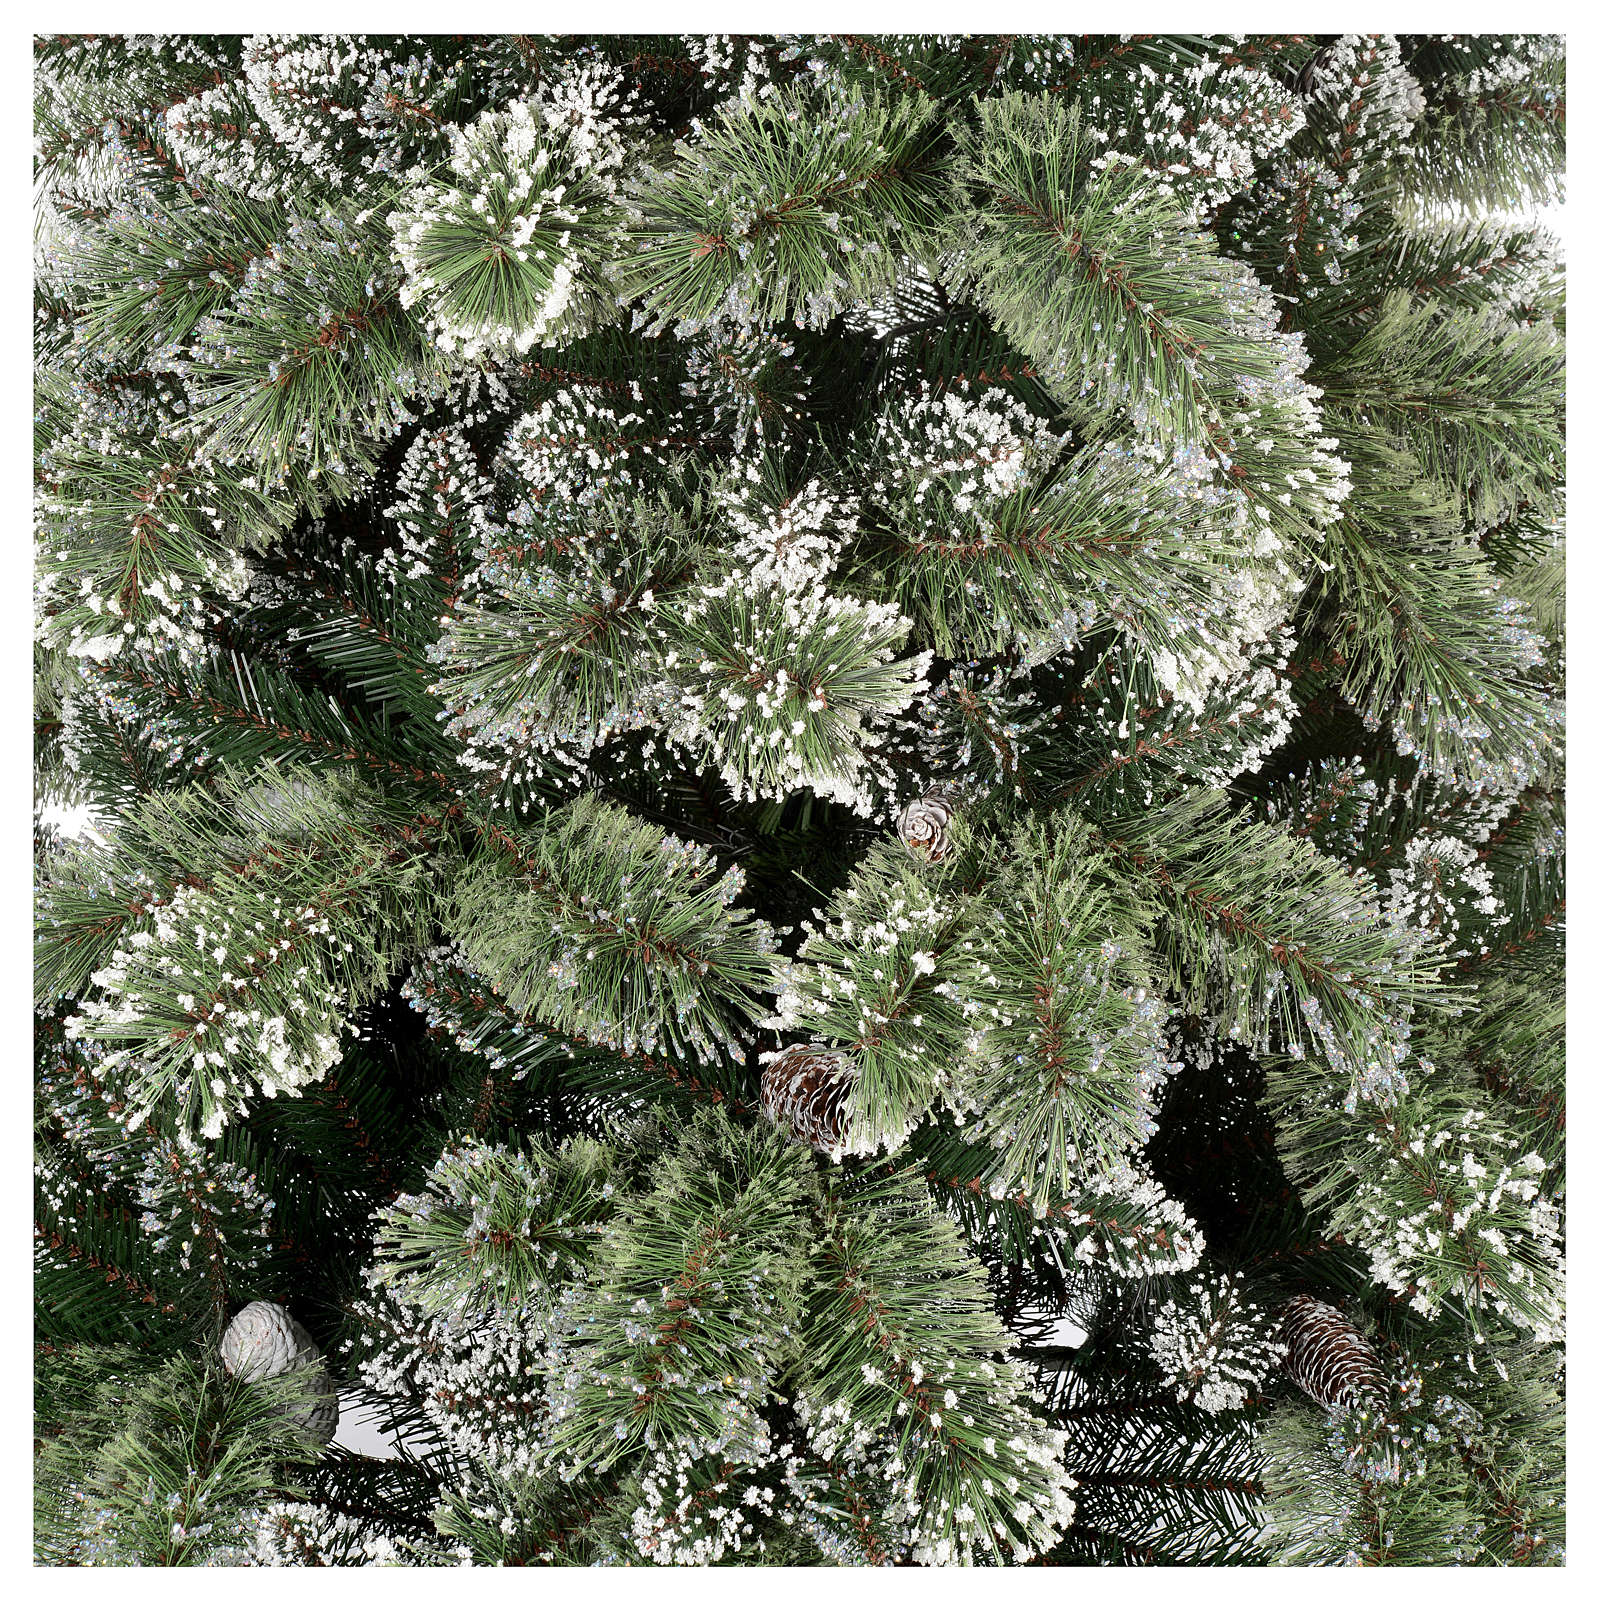 Sapin de Noël 225 cm vert avec glitter et pommes pin Bristle 3